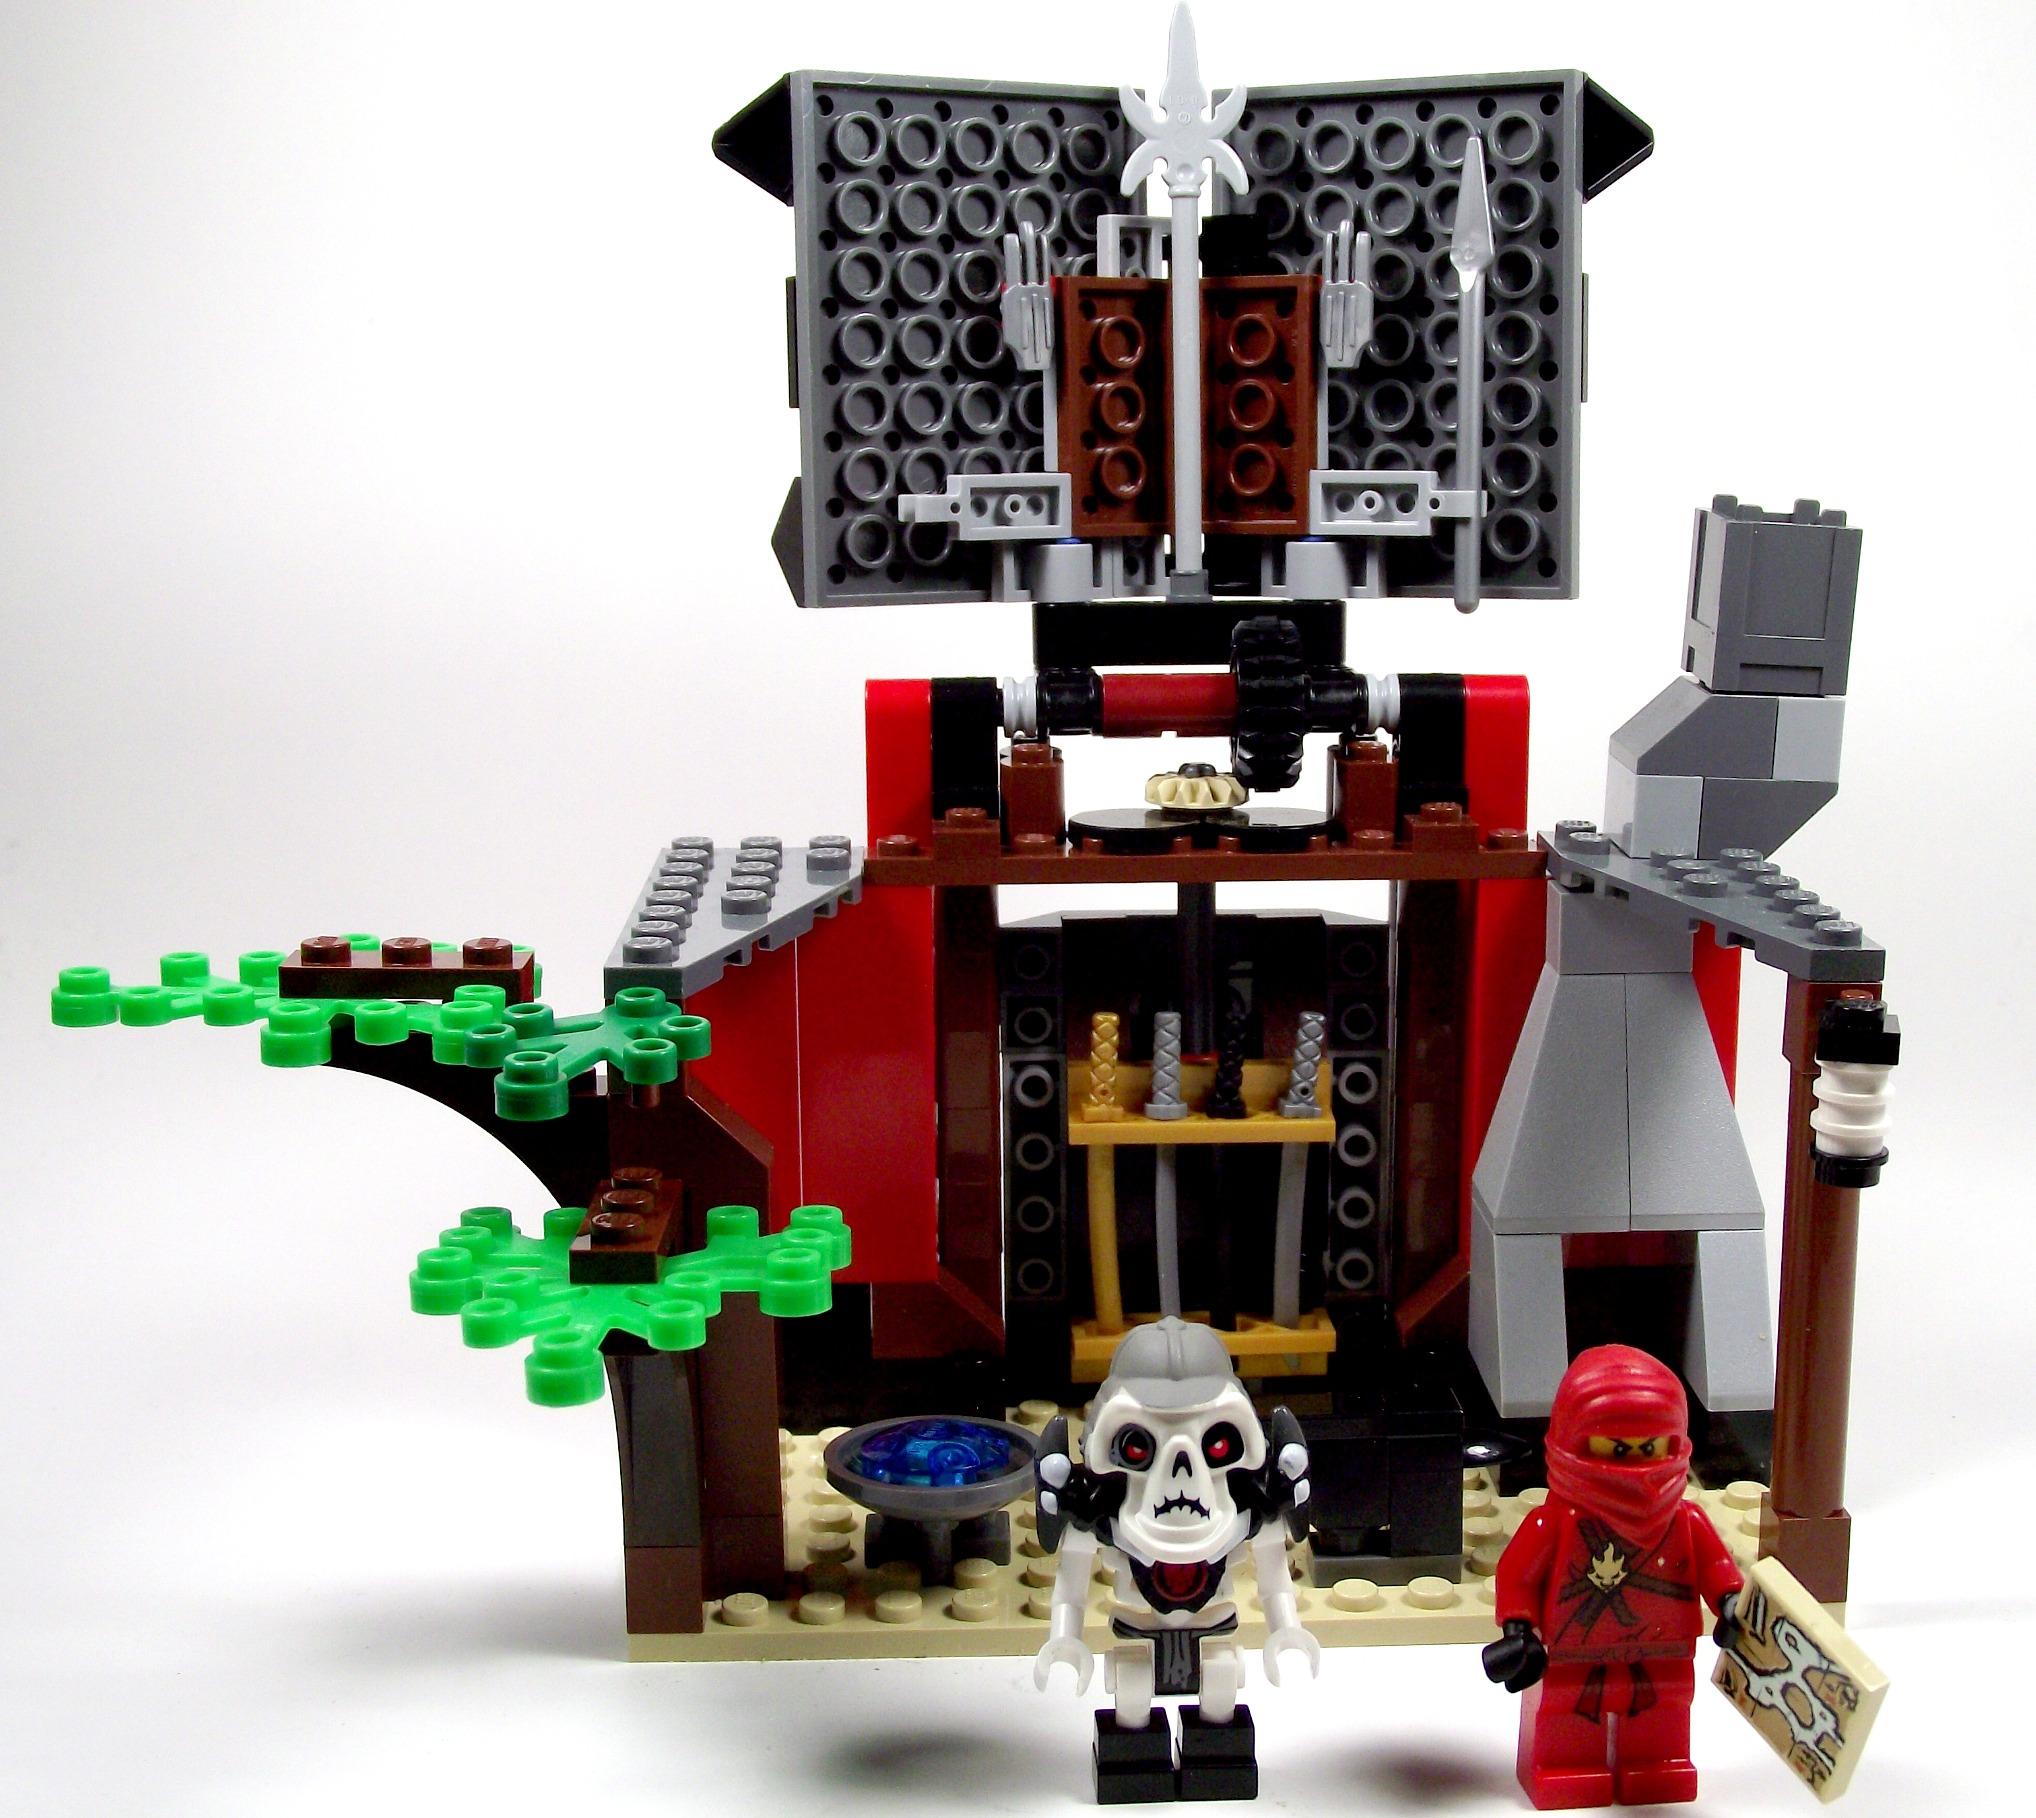 2508 Lego Ninjago Blacksmith's shop   Bricks N More